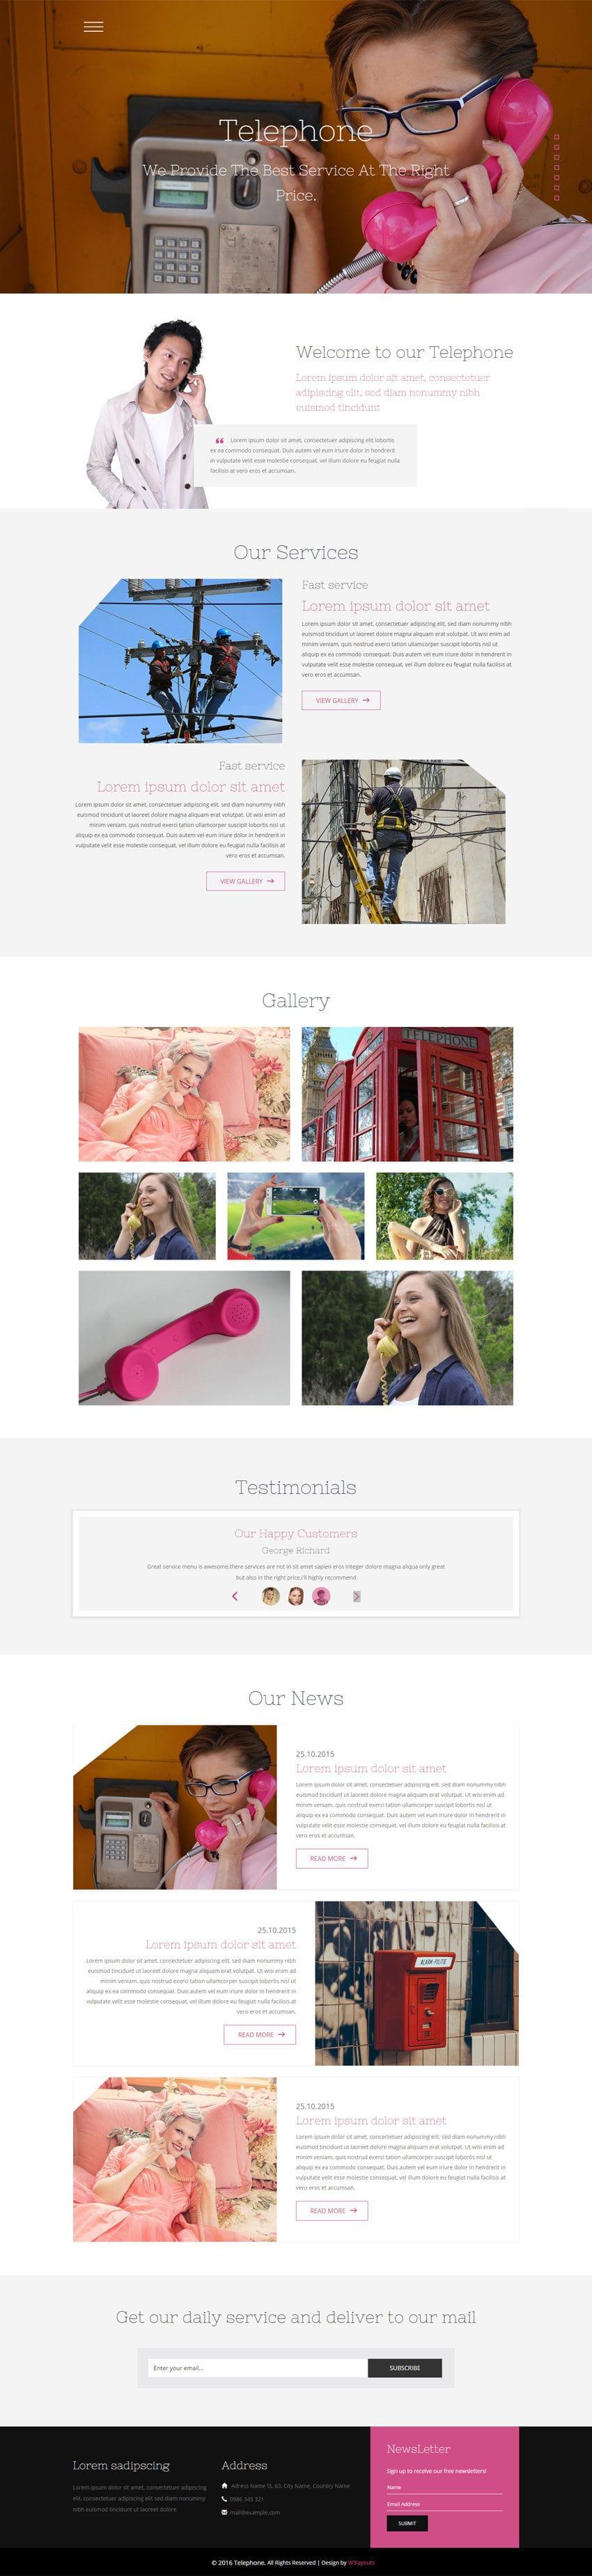 telephone-full